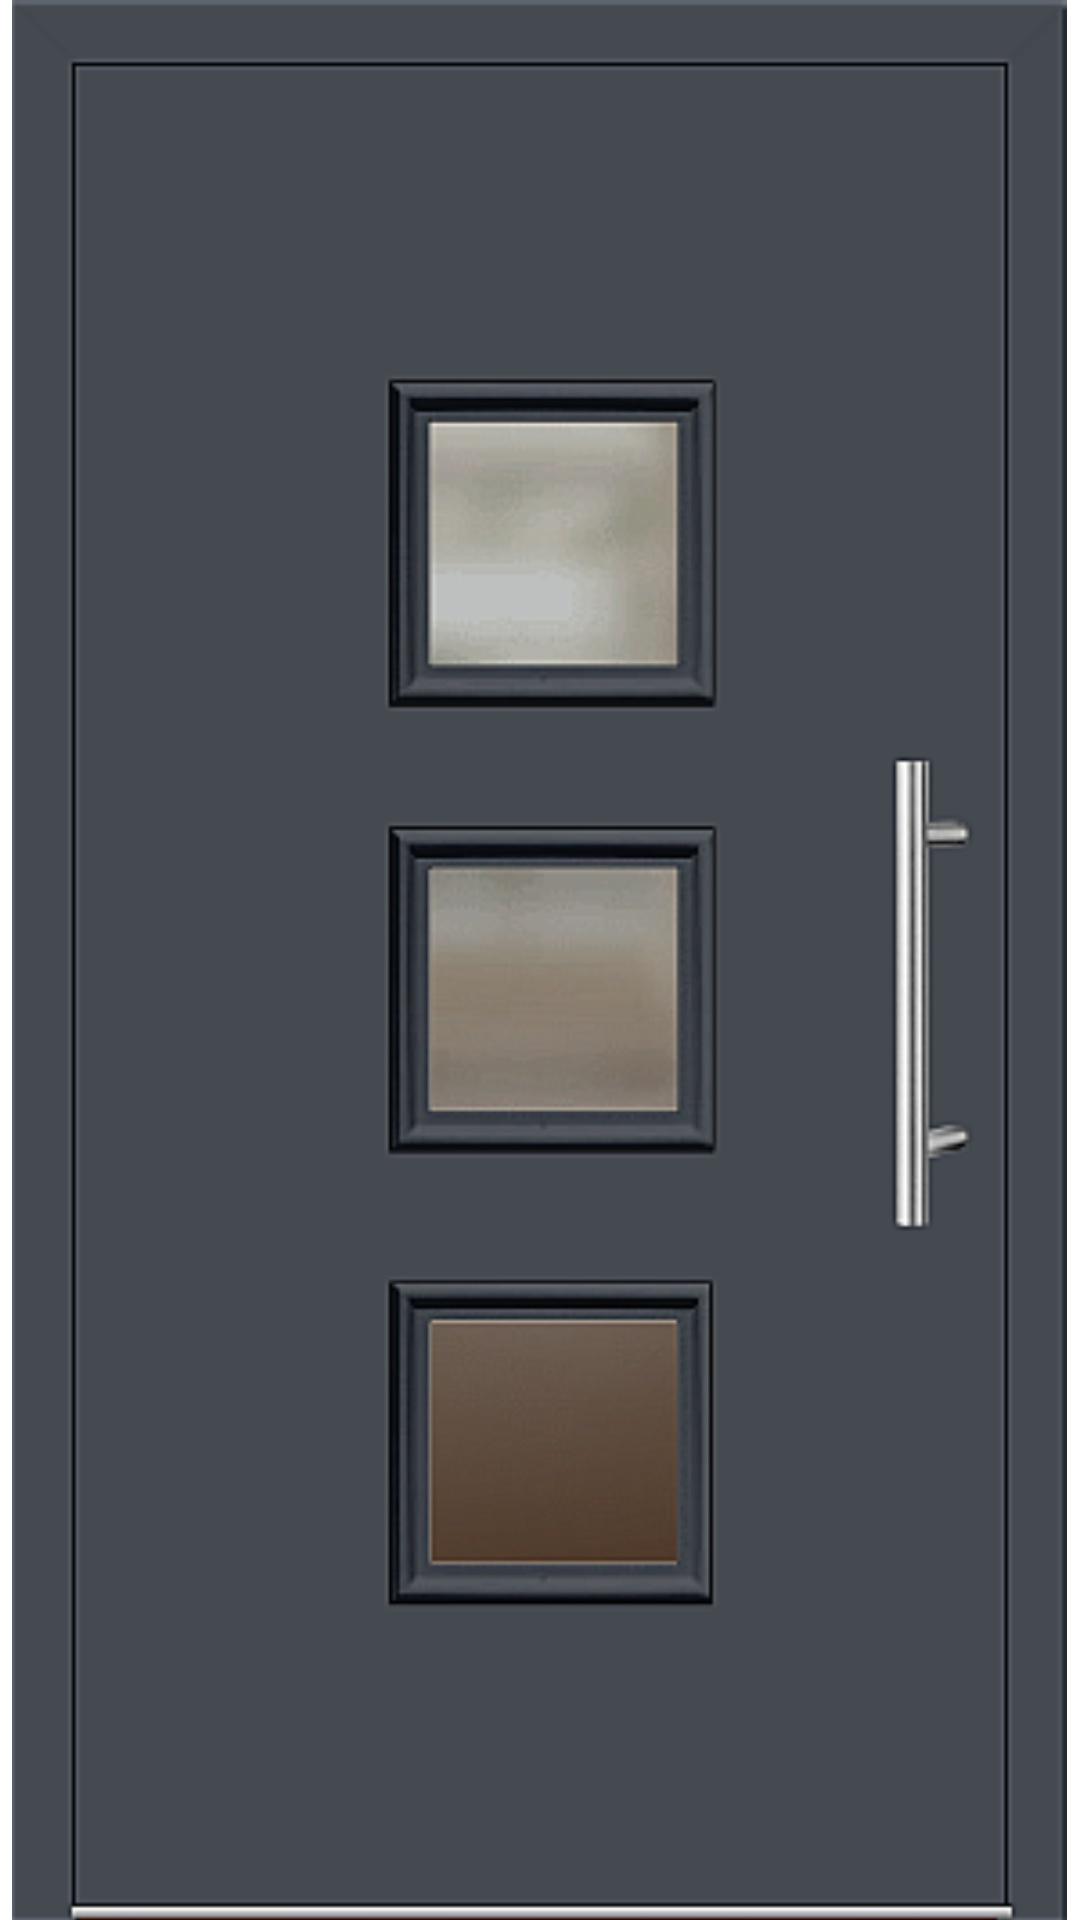 Aluminium Haustür Modell 6418-60 graphitgrau